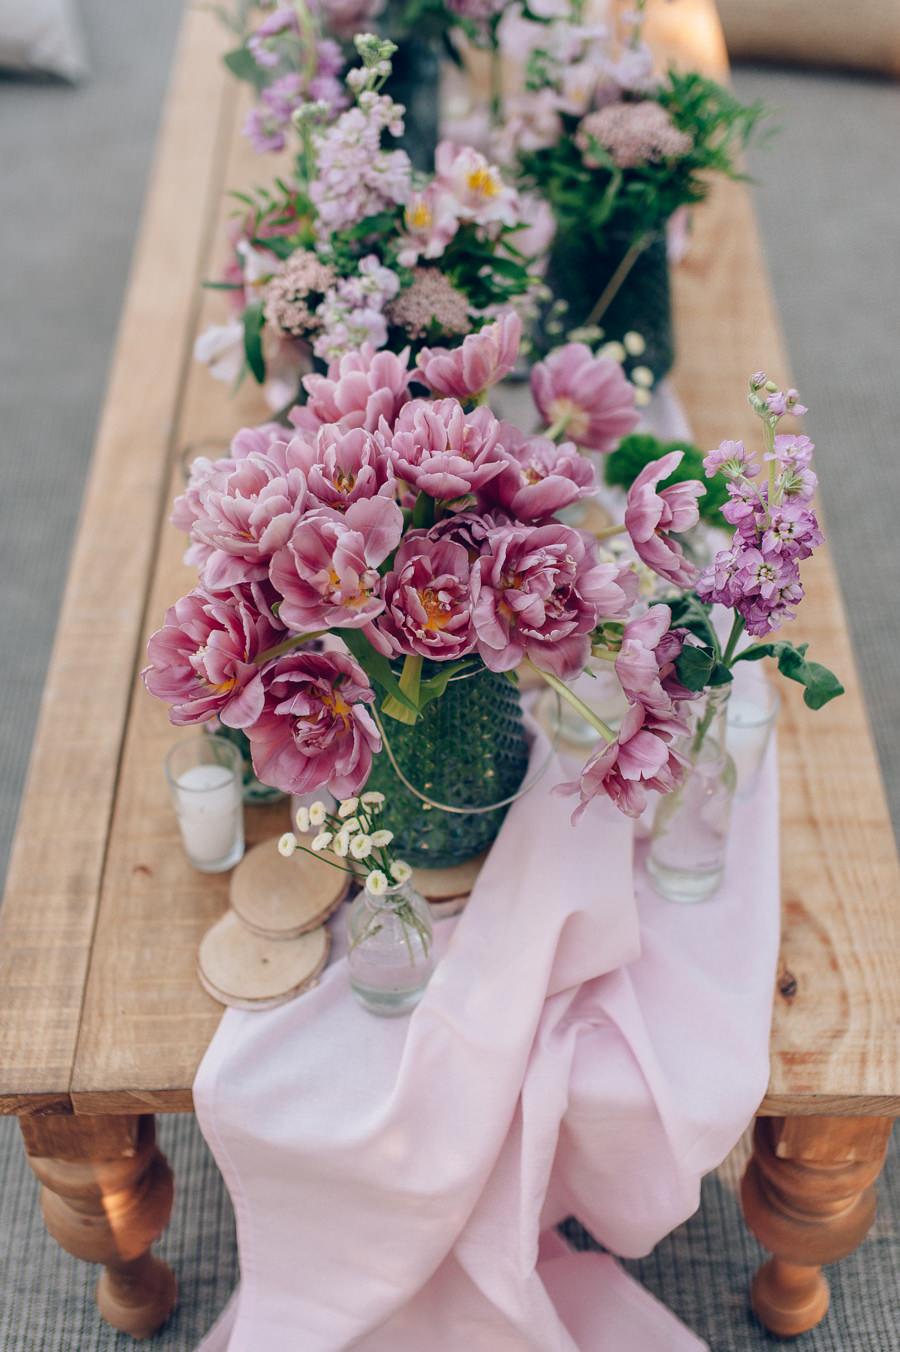 Flores para decorar tipis chill out 1